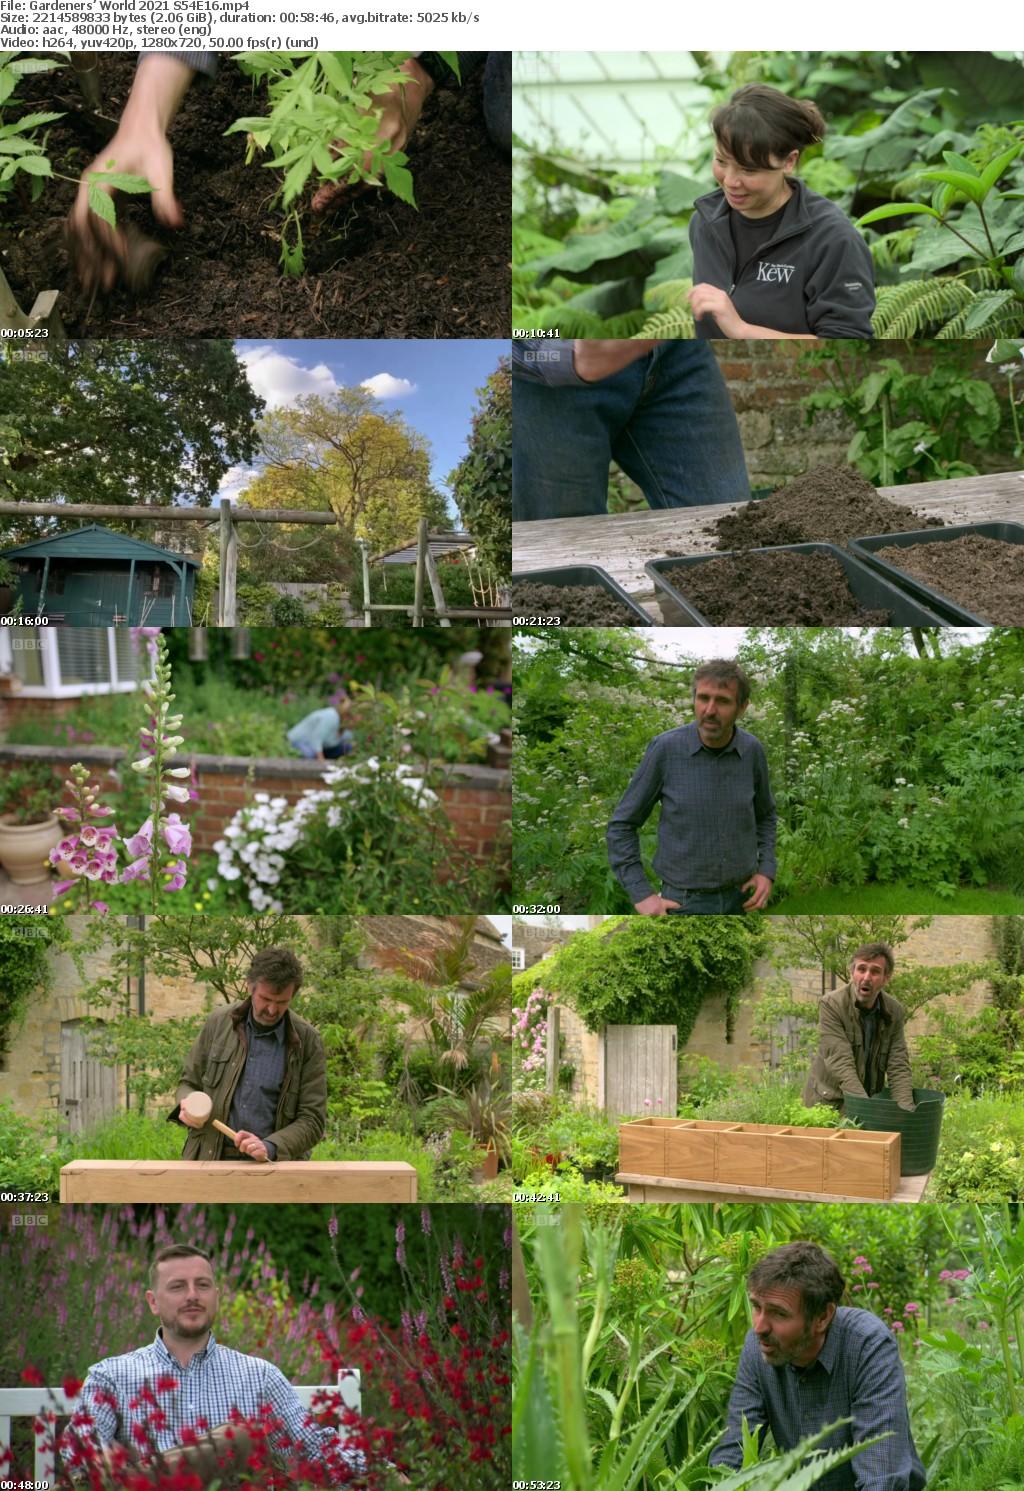 Gardeners World 2021 S54E16 (1280x720p HD, 50fps, soft Eng subs)